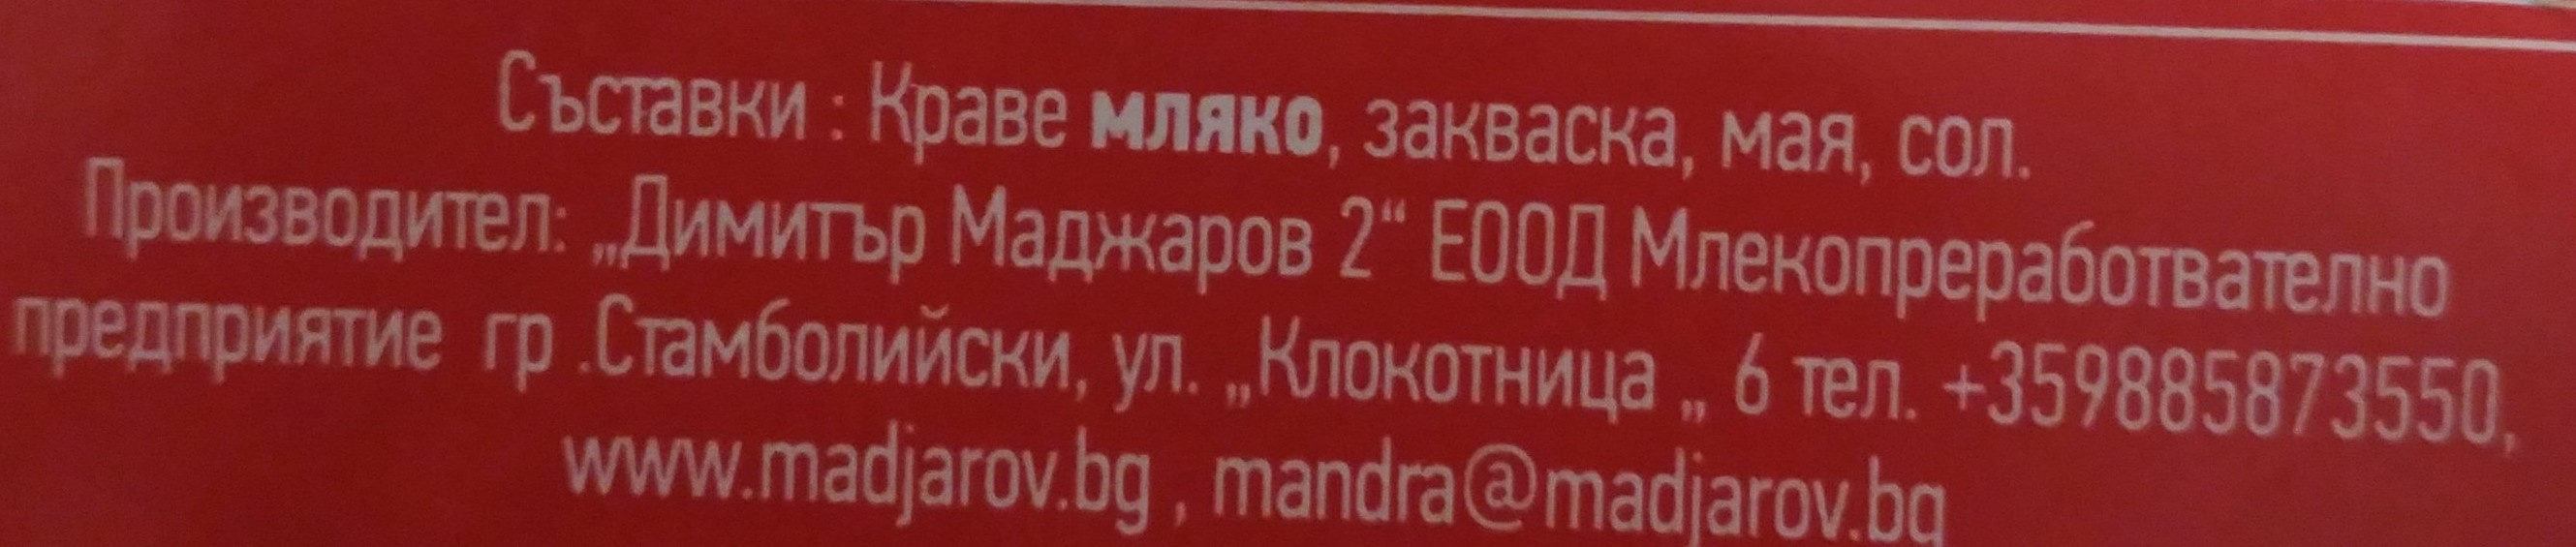 Български кашкавал от краве мляко - Inhaltsstoffe